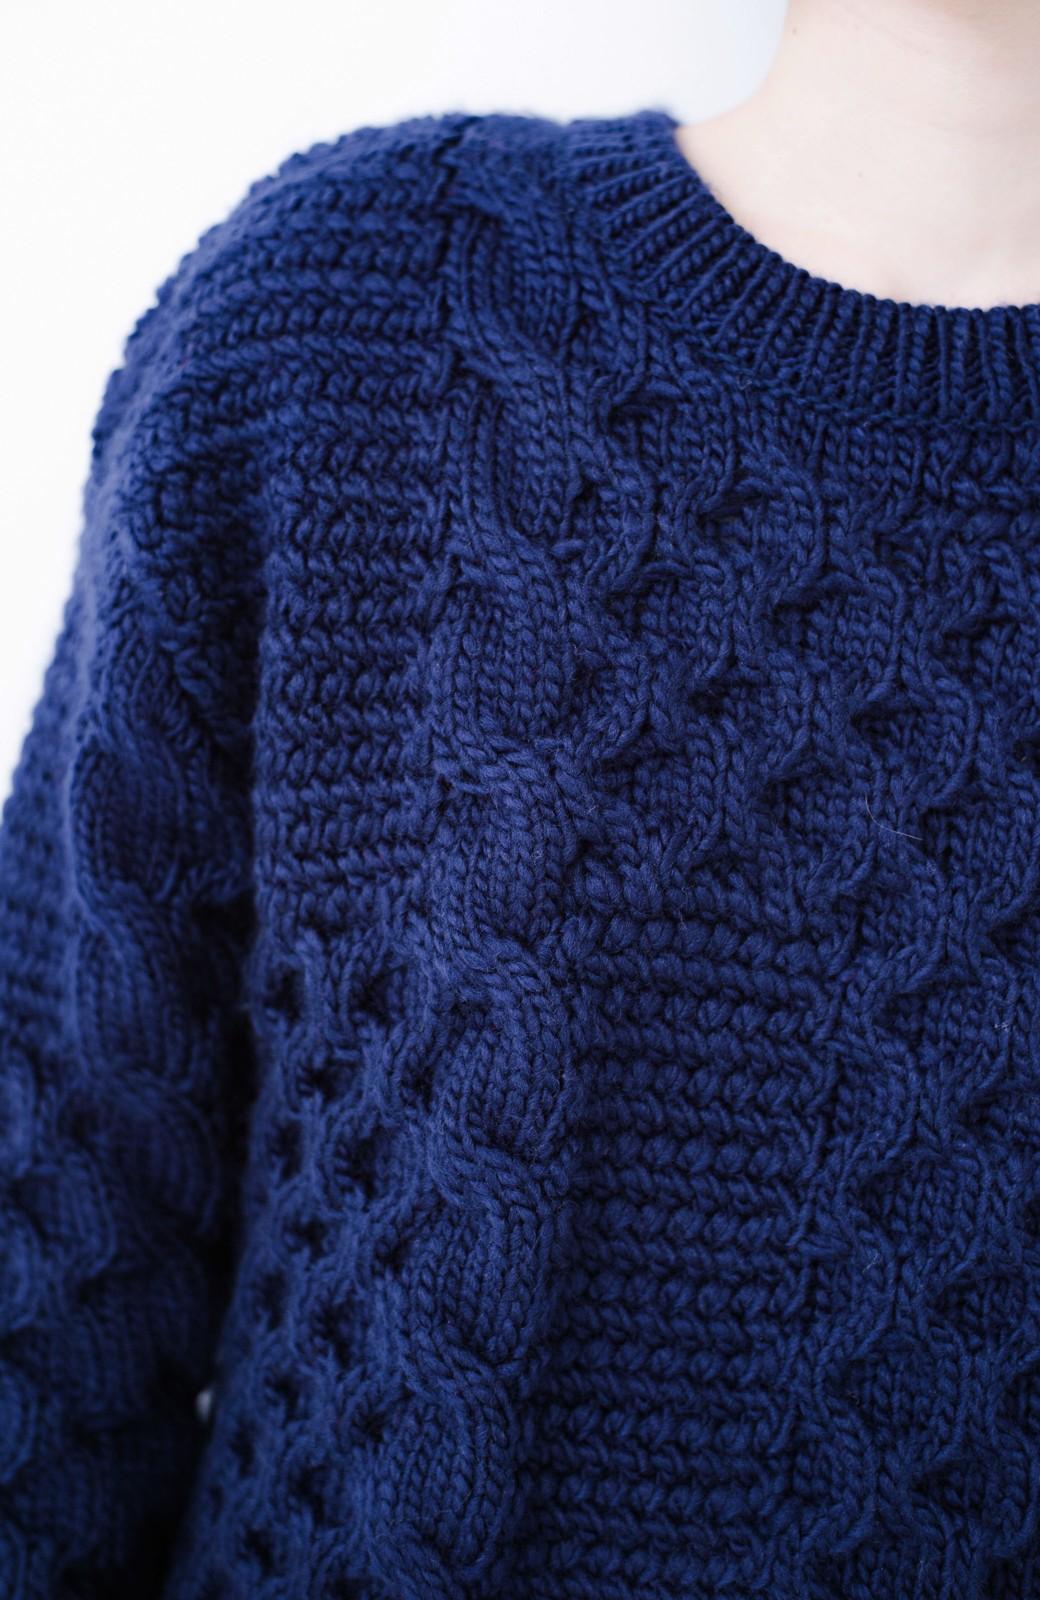 haco! 古着っぽい雰囲気がこなれたパネル編みケーブルニット <ネイビー>の商品写真6